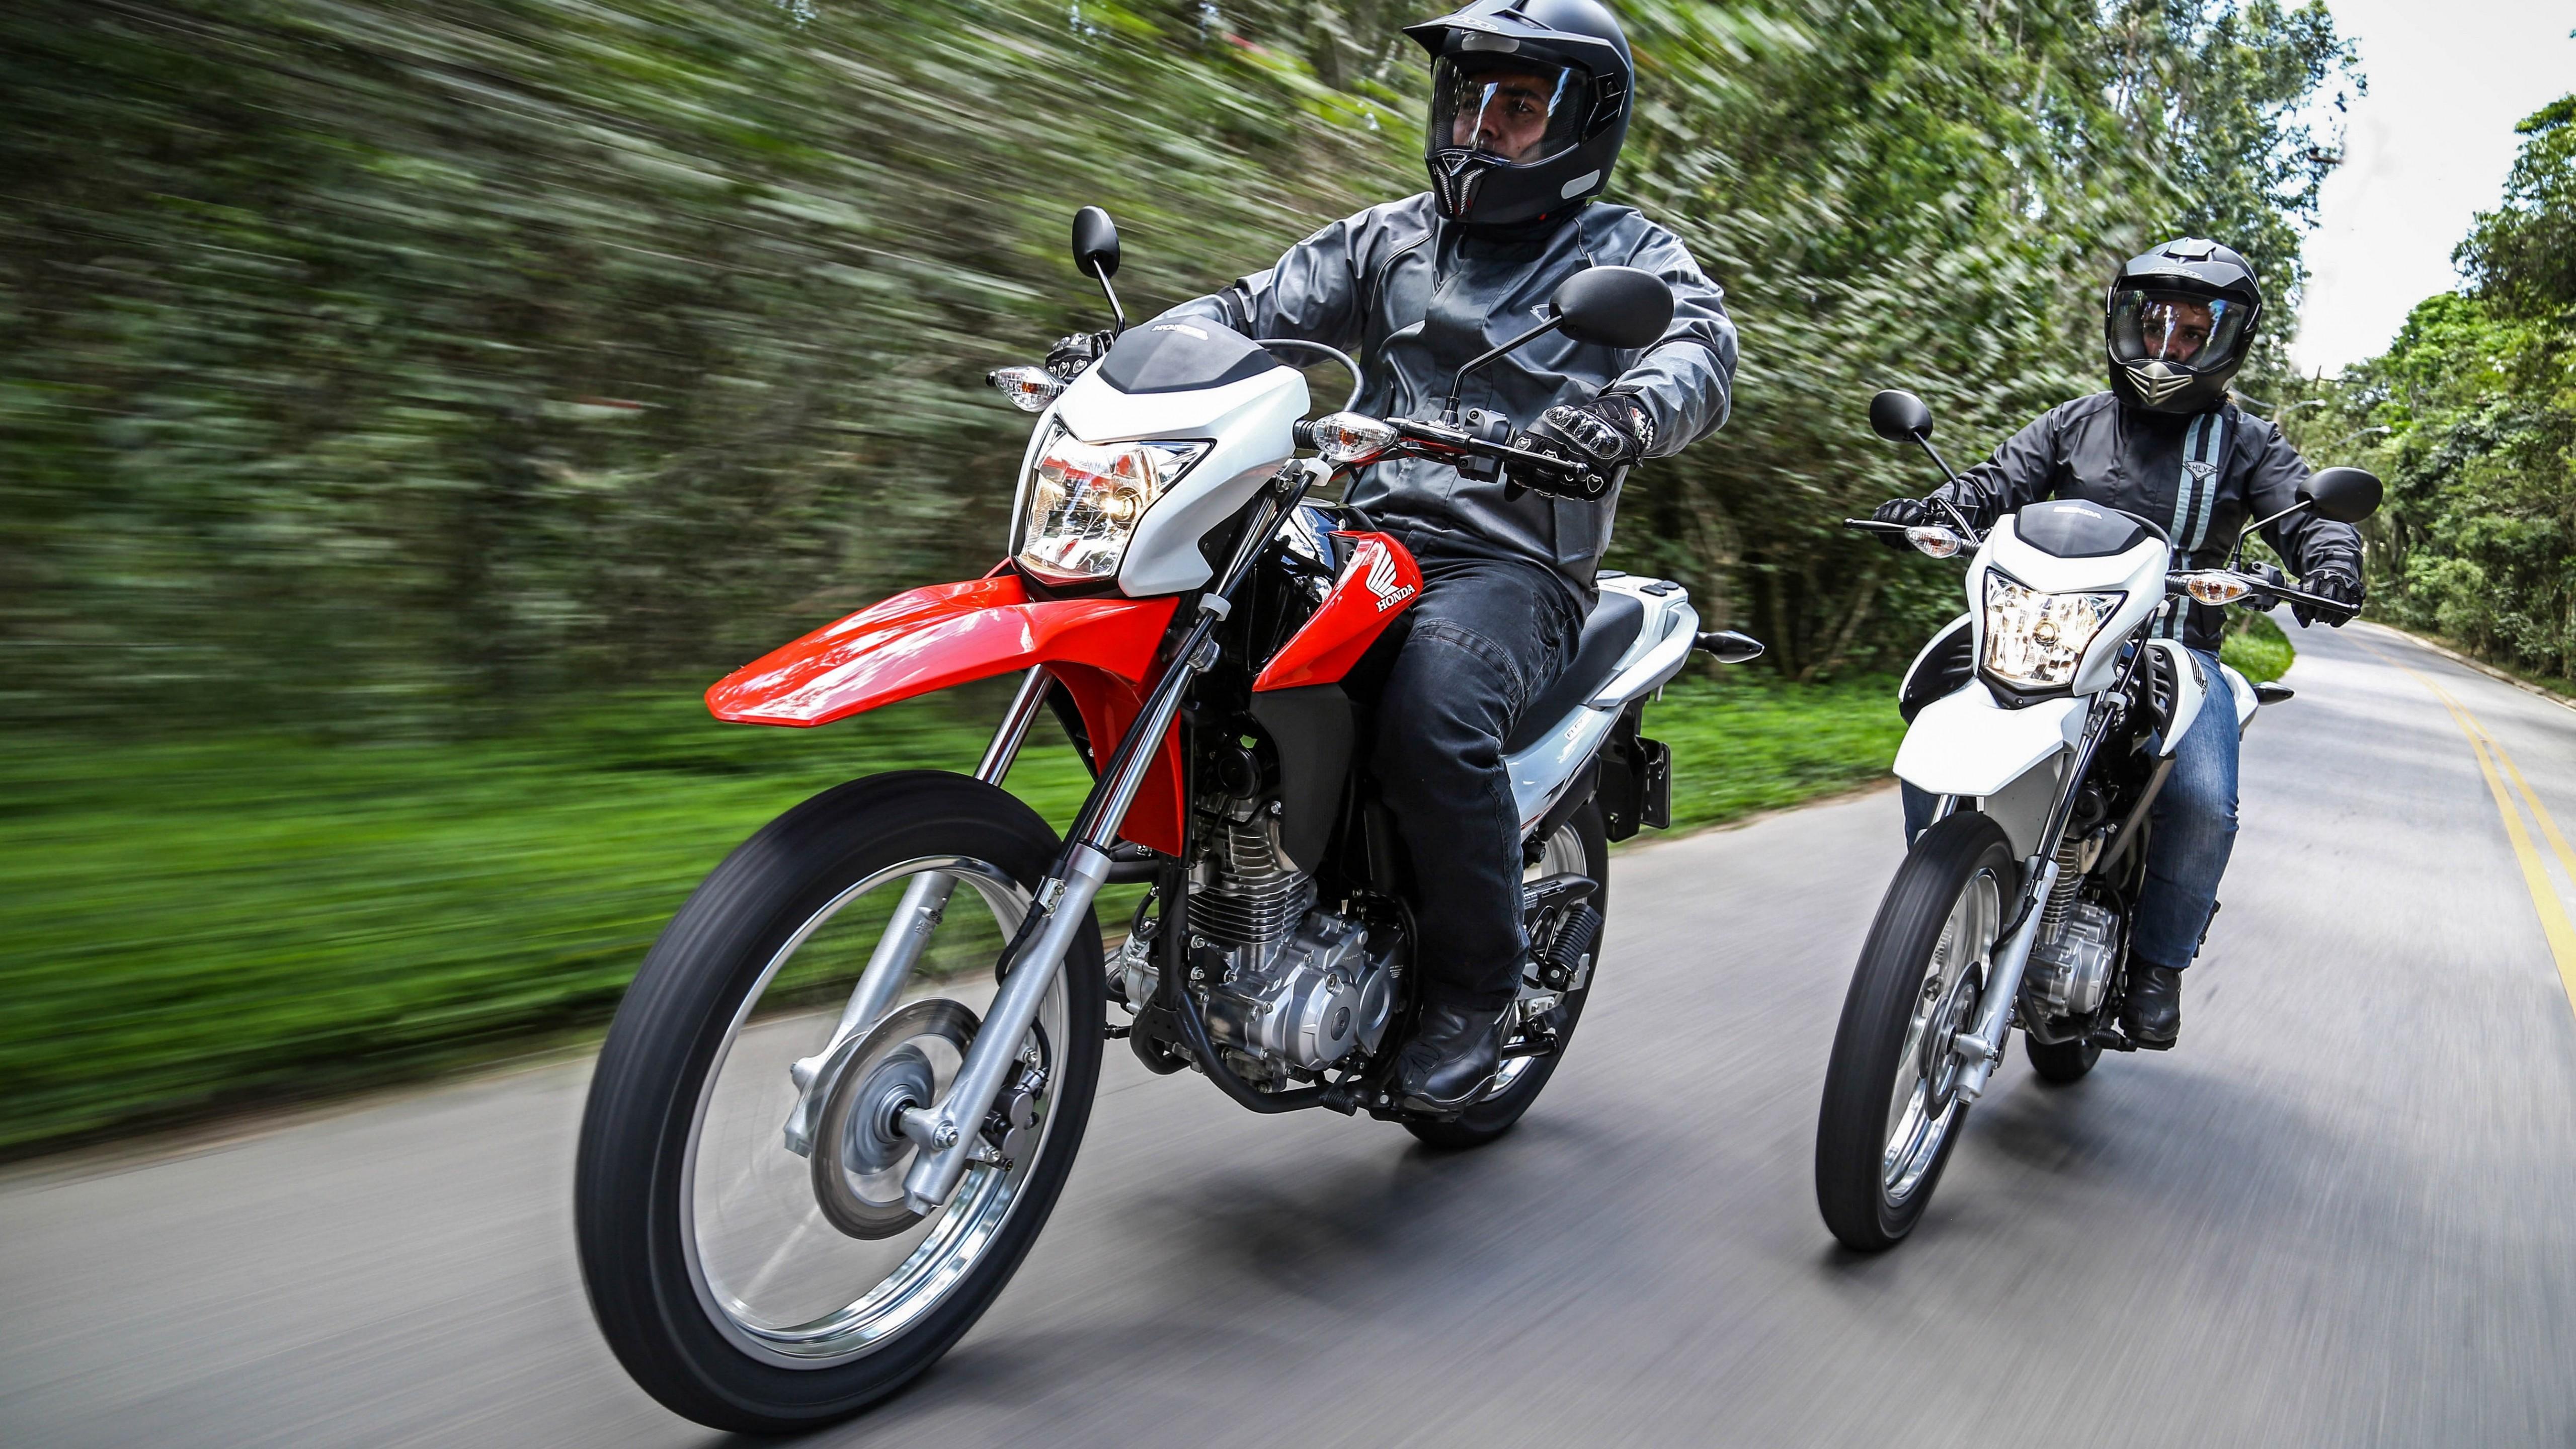 Wallpaper Honda Bros 160 MXR 160 Best Bikes 2015 motorcycle 5120x2880